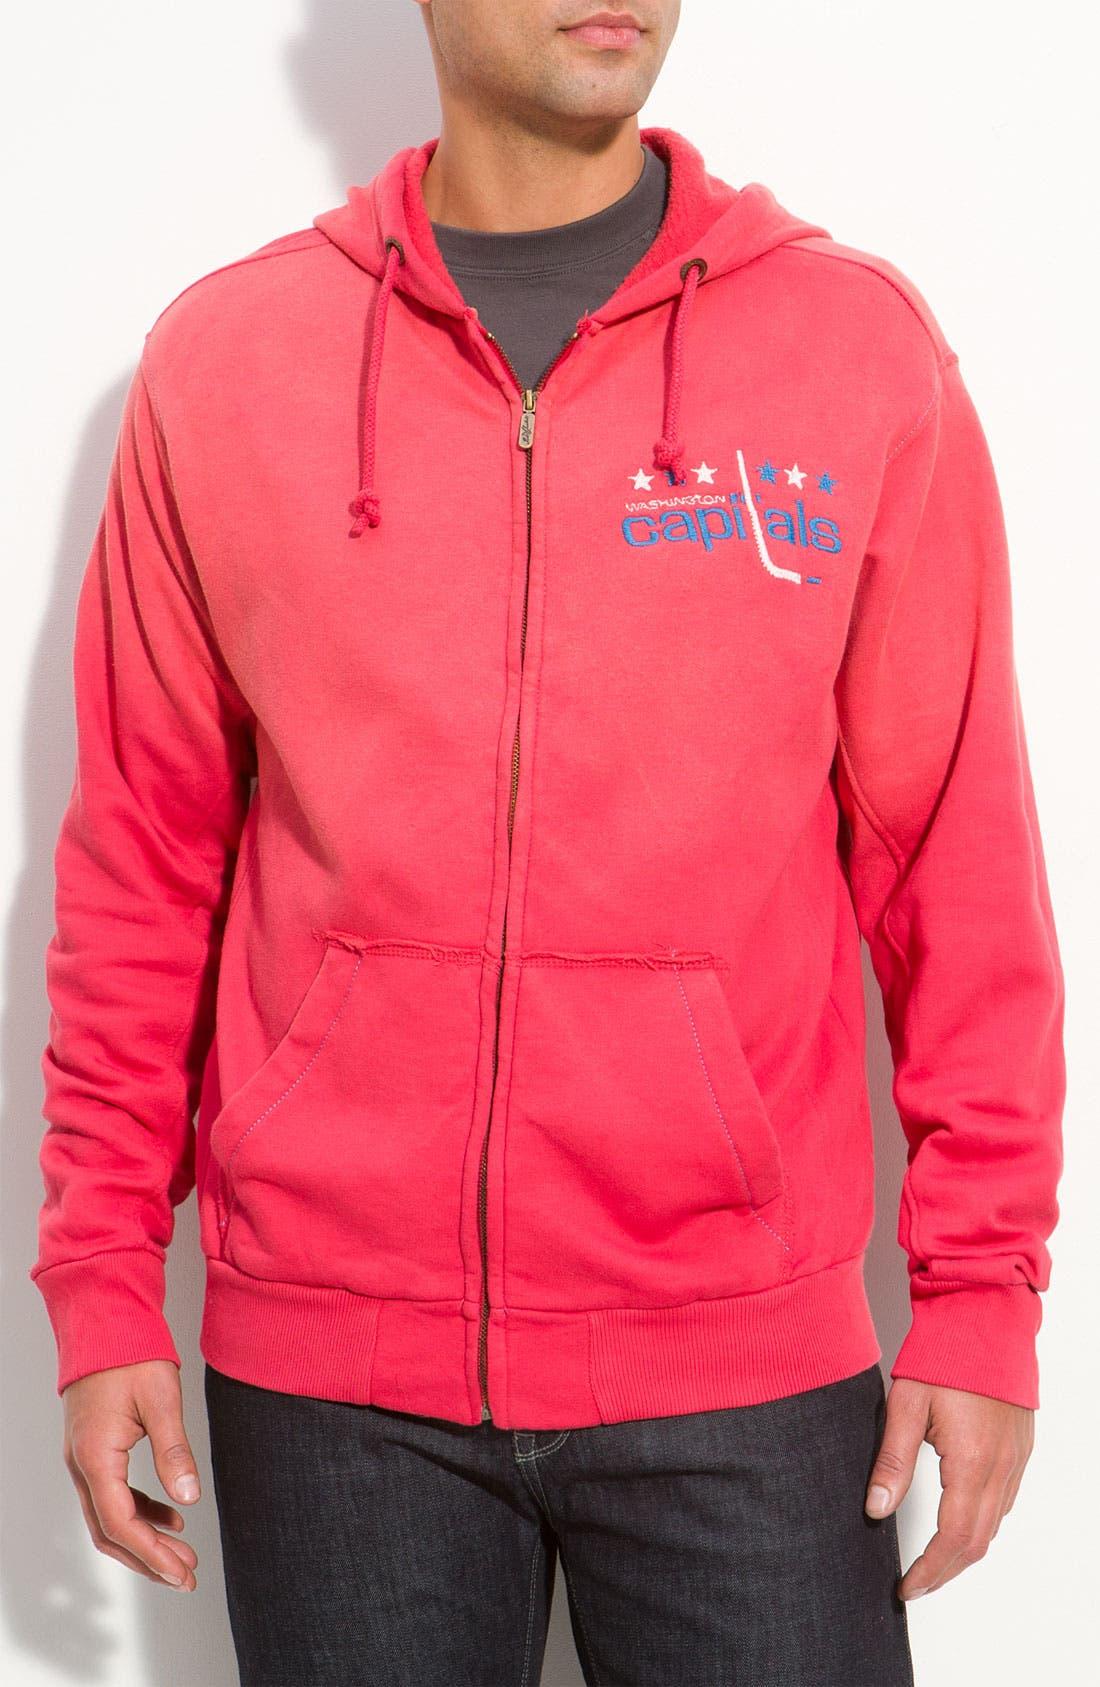 Alternate Image 1 Selected - Red Jacket 'Capitals' Hoodie